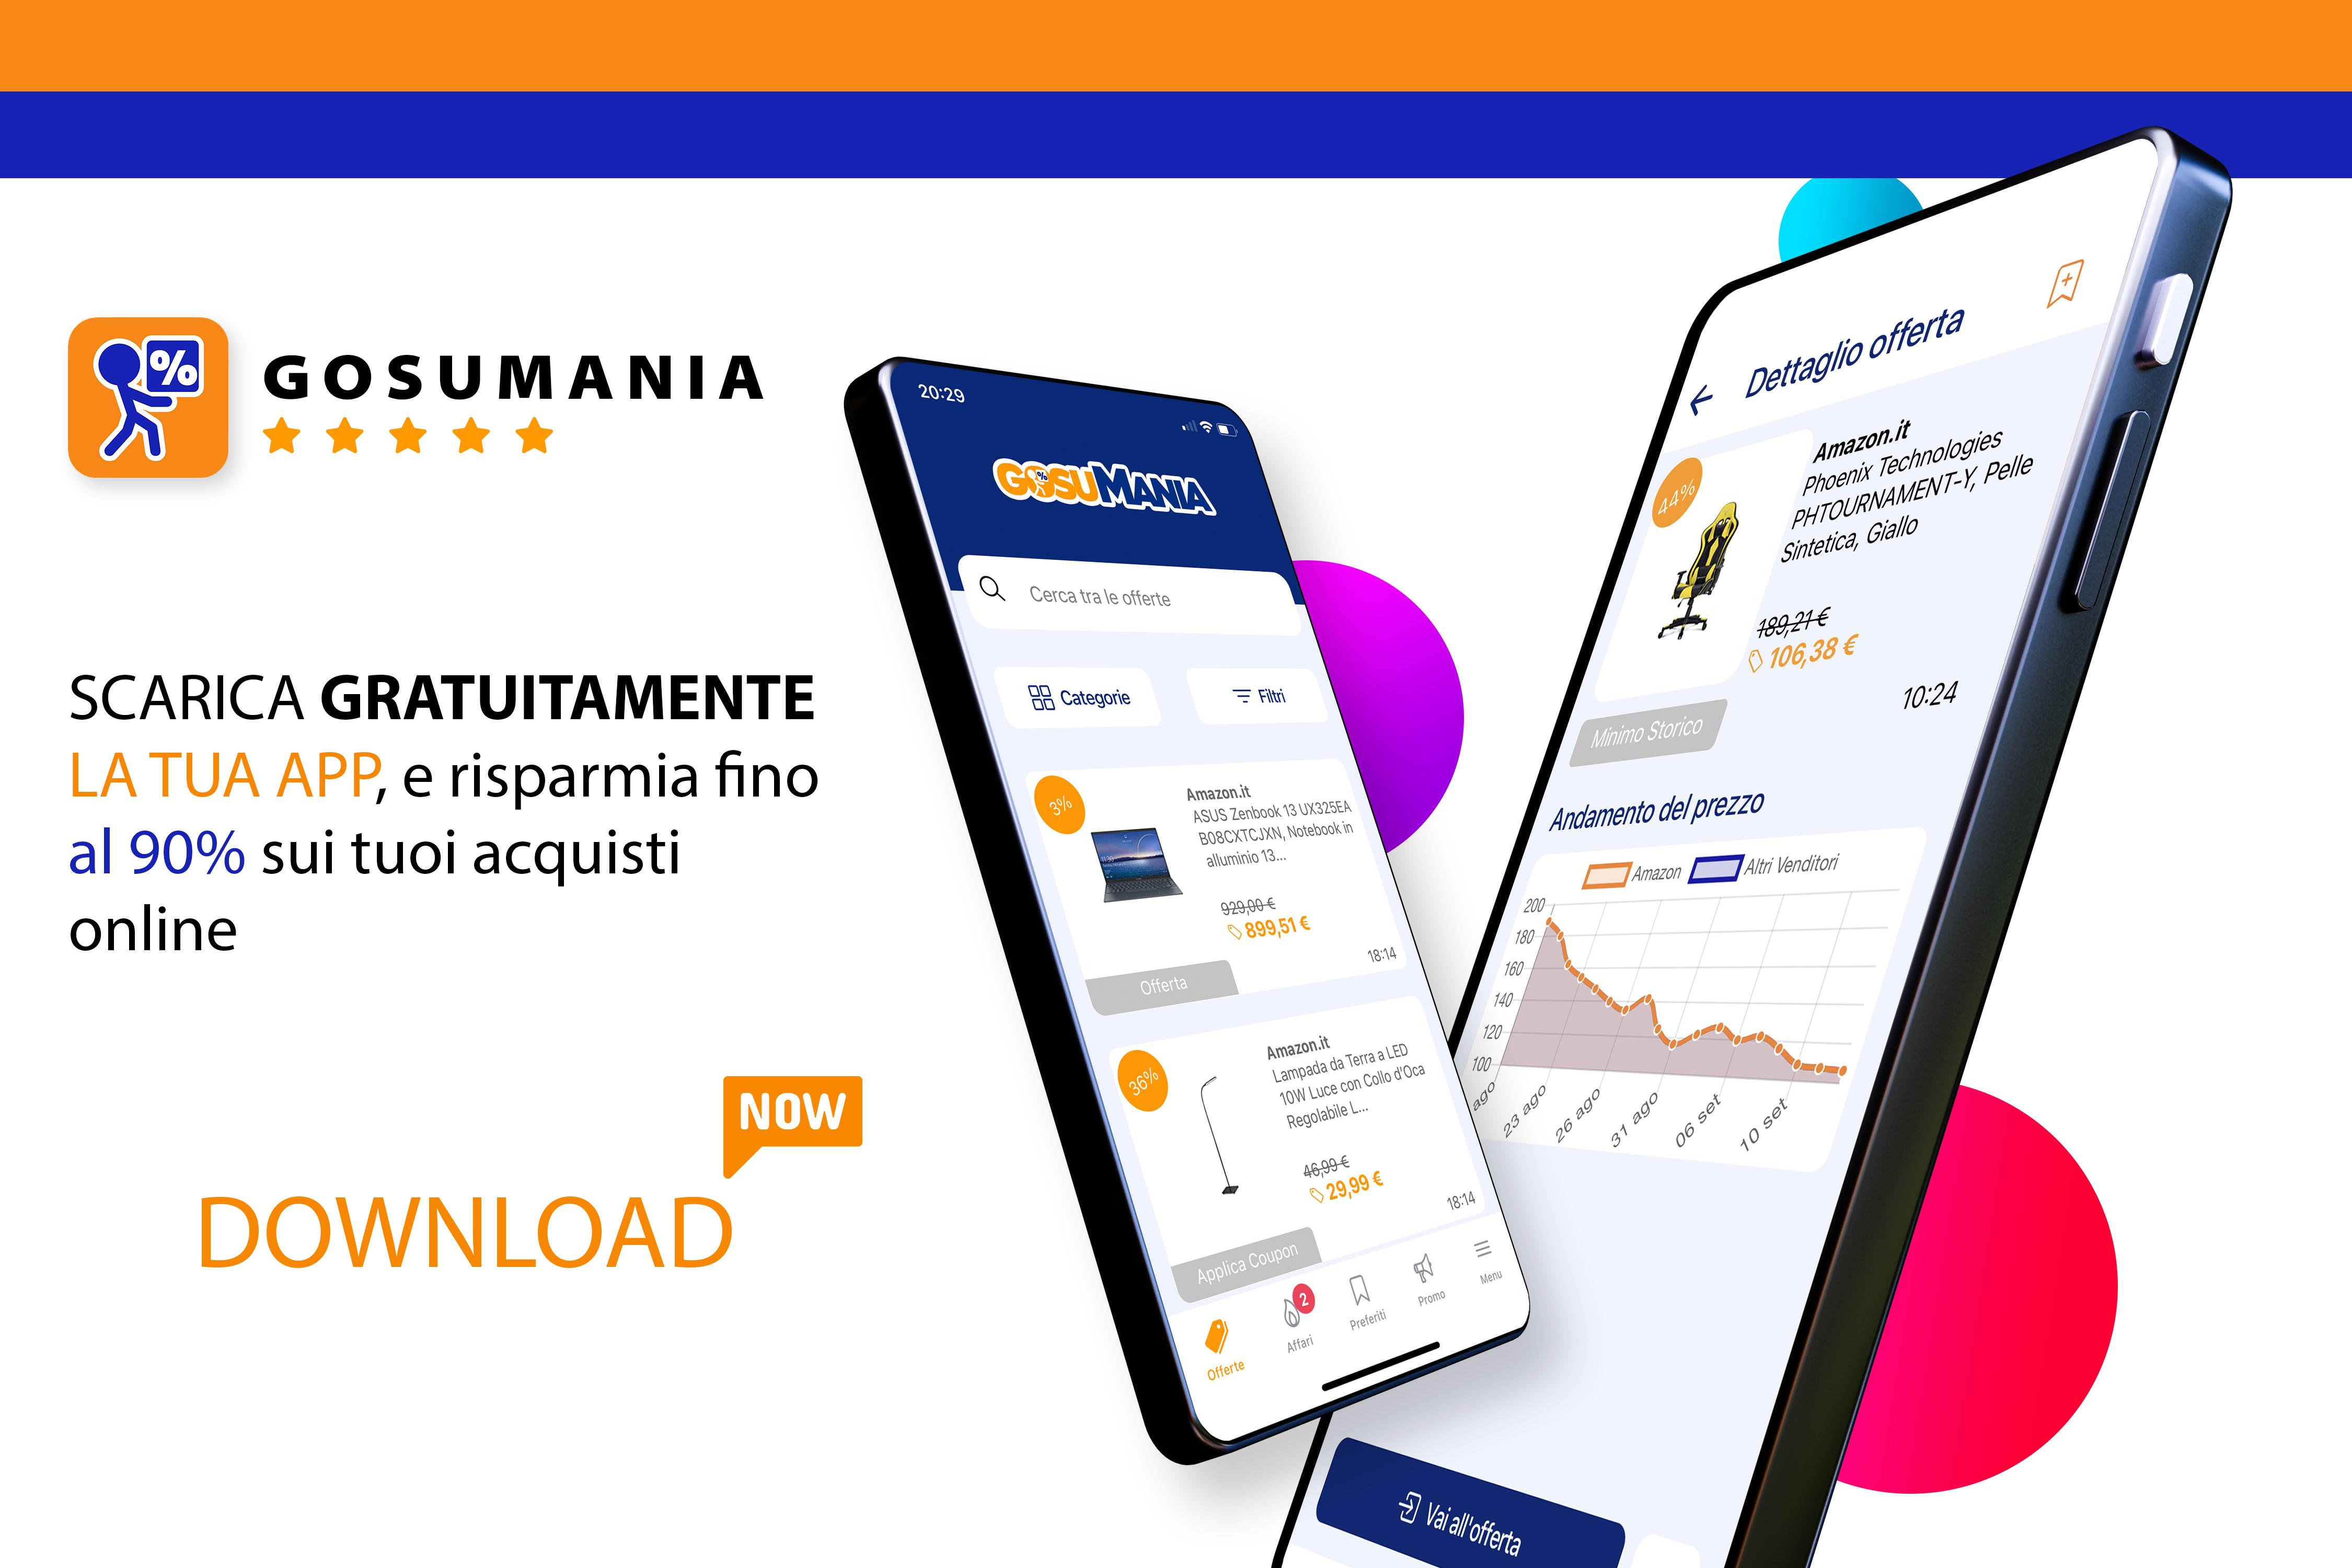 scarica app Download app lista preferiti App Gosumania Amazon sconto offerte codici coupon